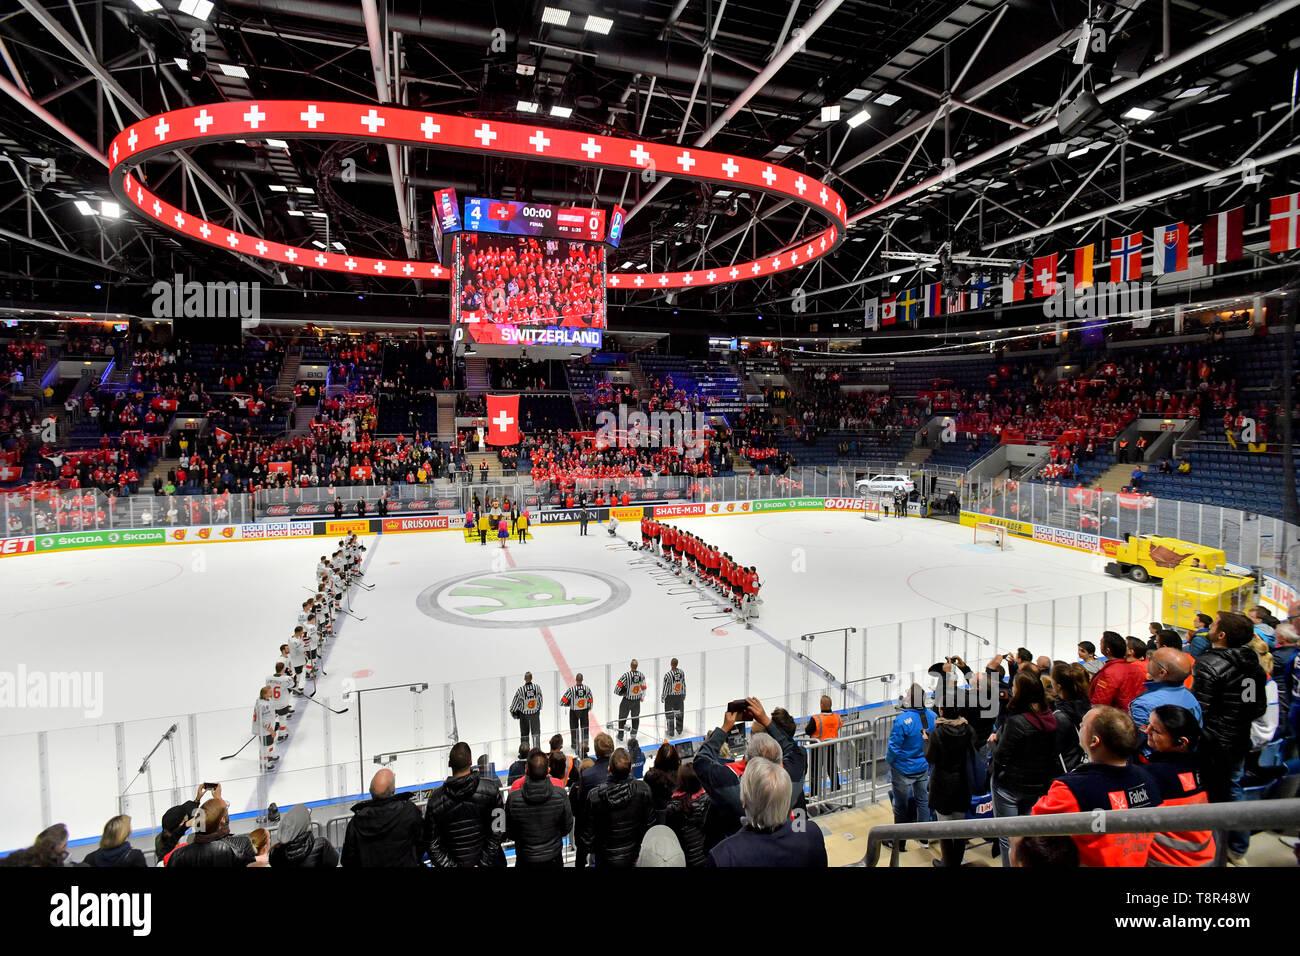 Bratislava, Slovakia. 14th May, 2019. Players listen the Swiss national anthem after the match Switzerland against Austria at the 2019 IIHF World Championship in Bratislava, Slovakia, on May 14, 2019. Credit: Vit Simanek/CTK Photo/Alamy Live News Stock Photo